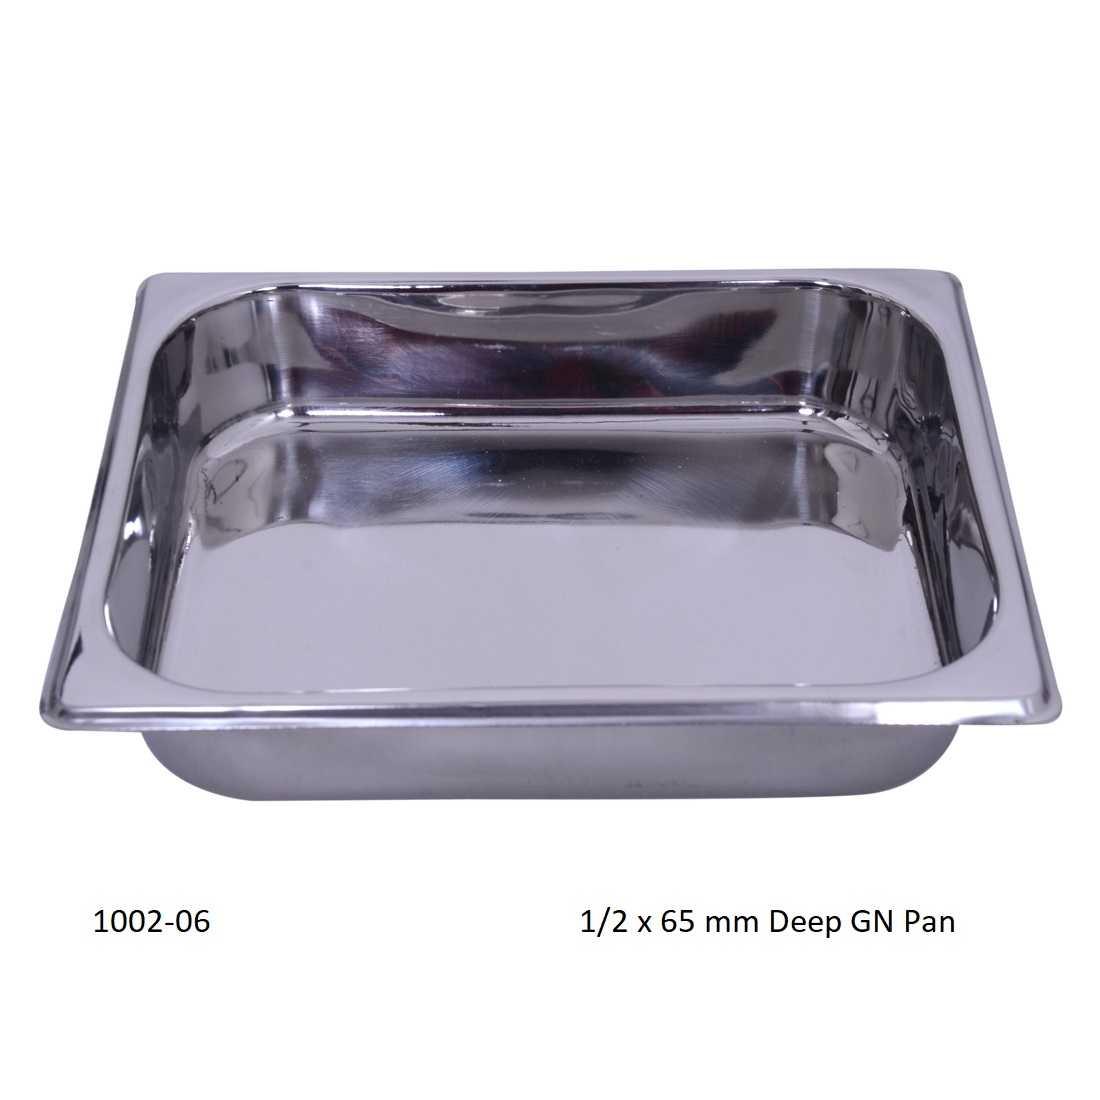 Steello 1/2 x 65 mm Deep GN Pan's Product catelog